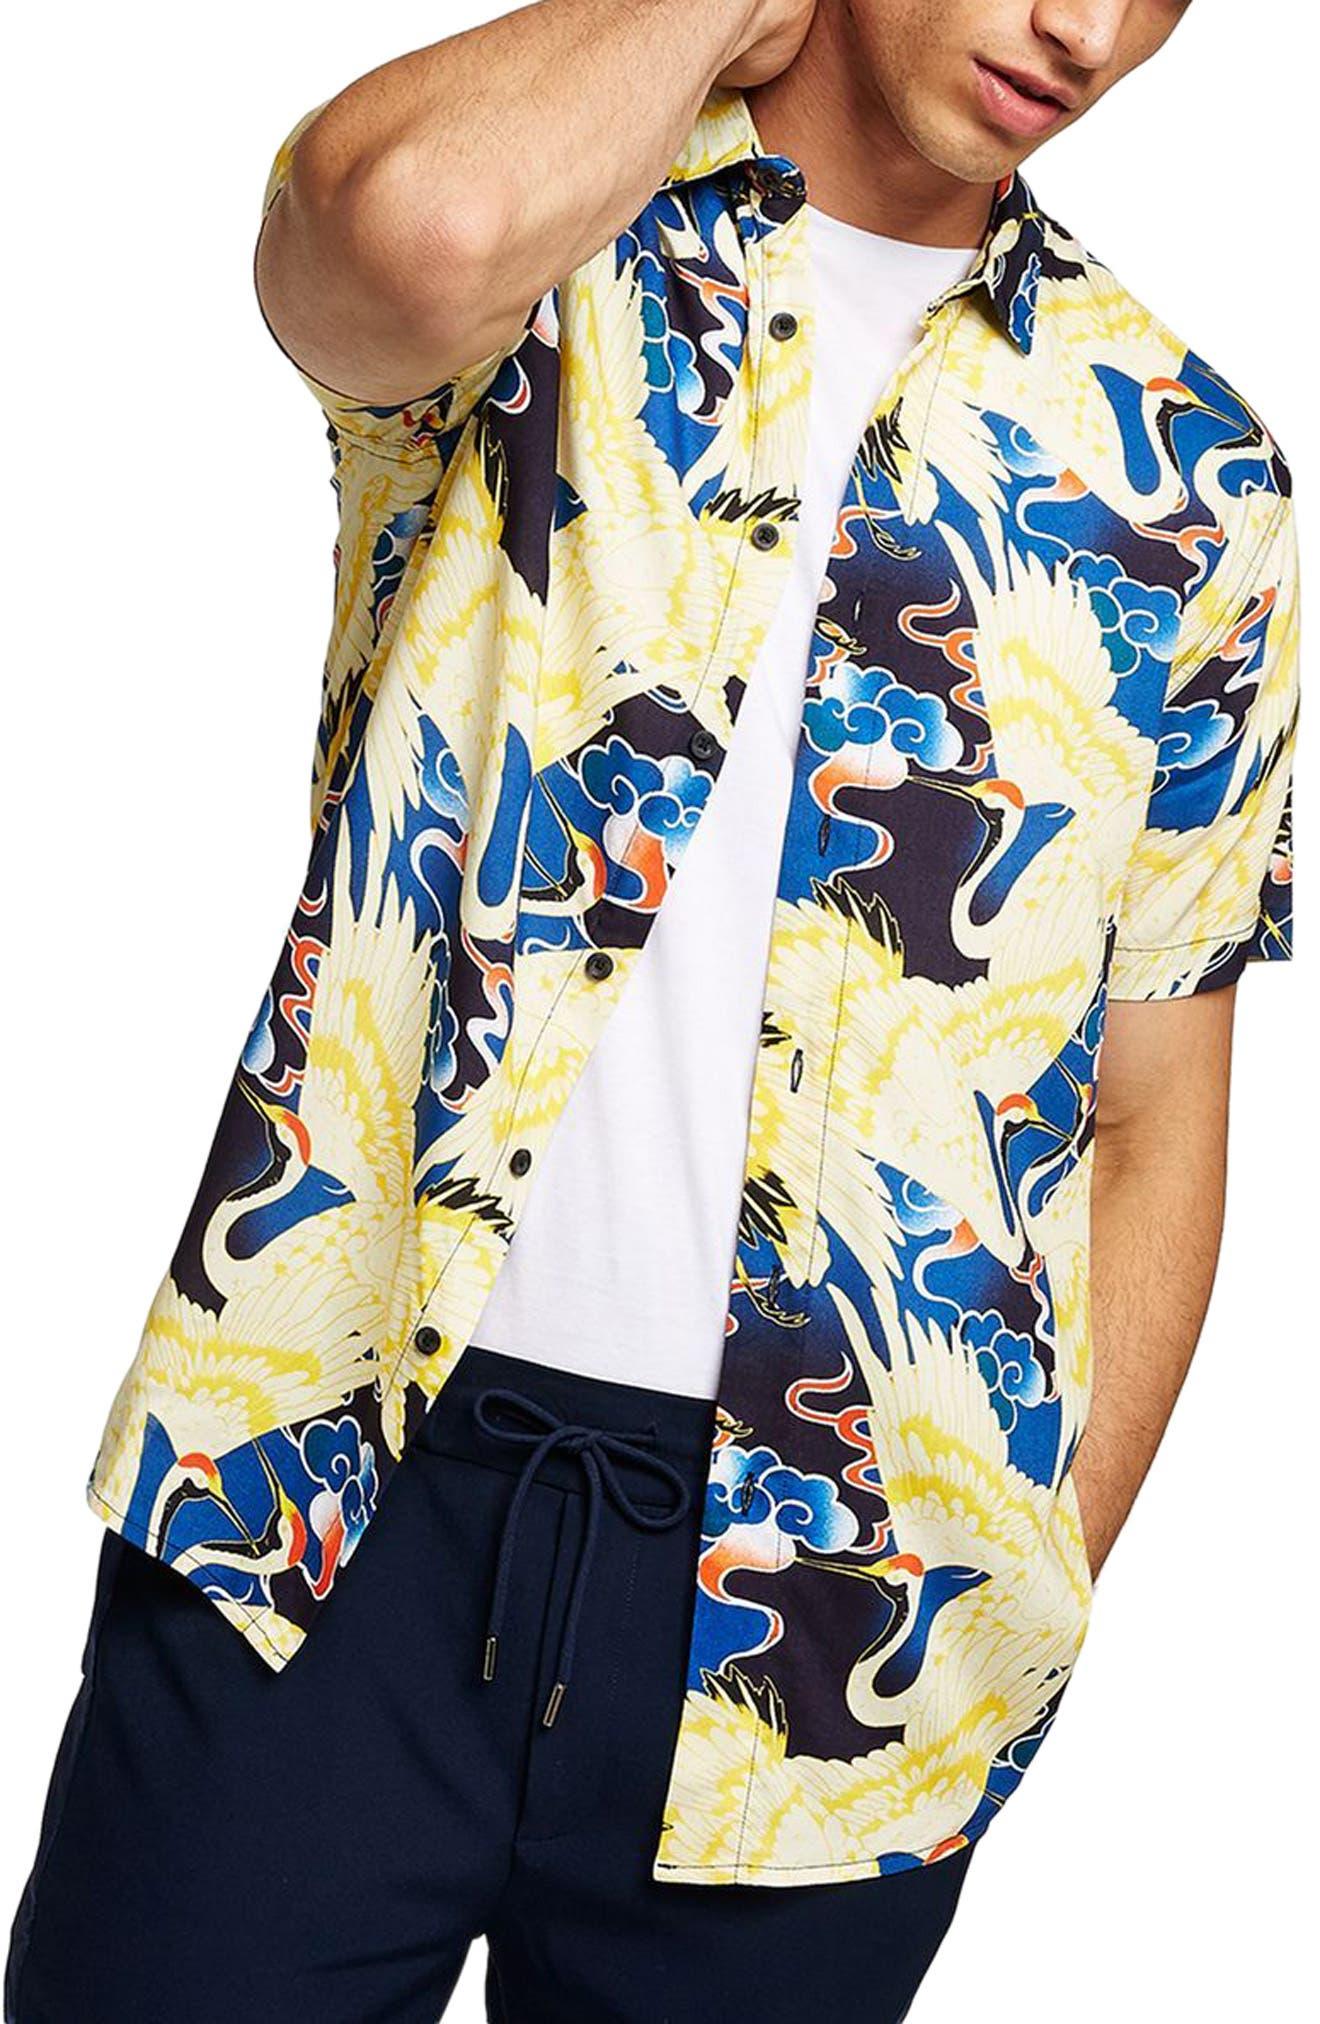 Crane Print Woven Shirt,                             Main thumbnail 1, color,                             YELLOW MULTI